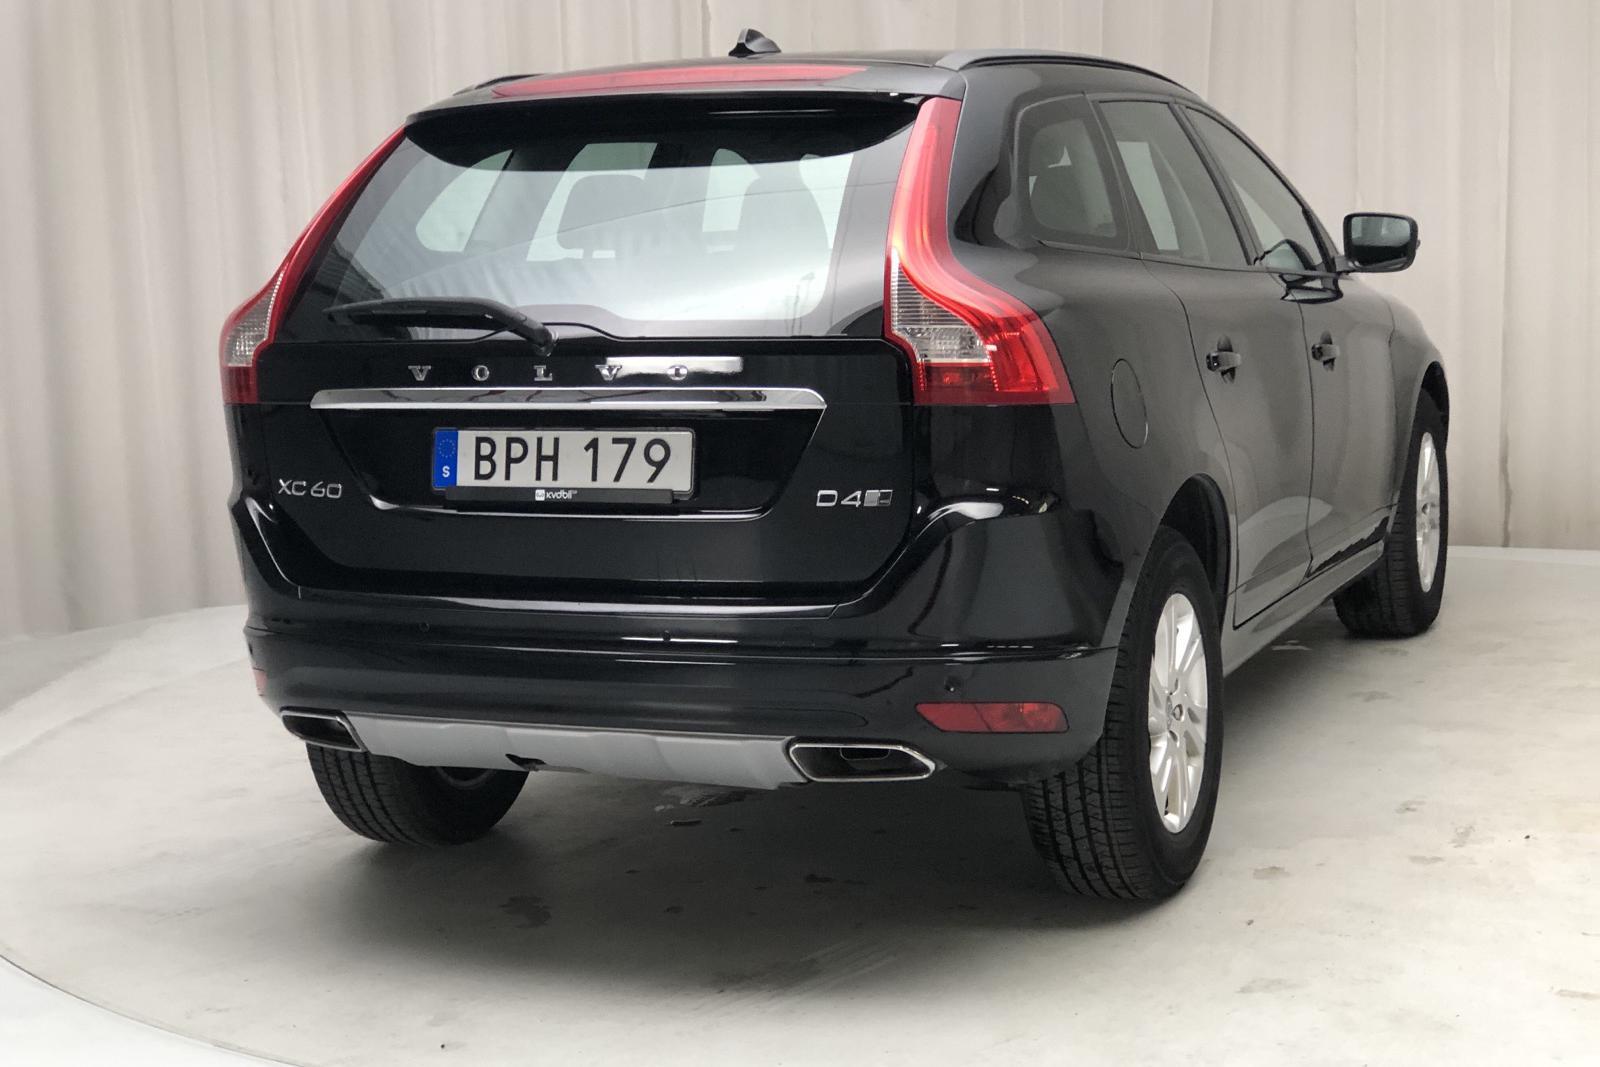 Volvo XC60 D4 AWD Classic VOC(190hk) - 0 km - Automatic - black - 2017